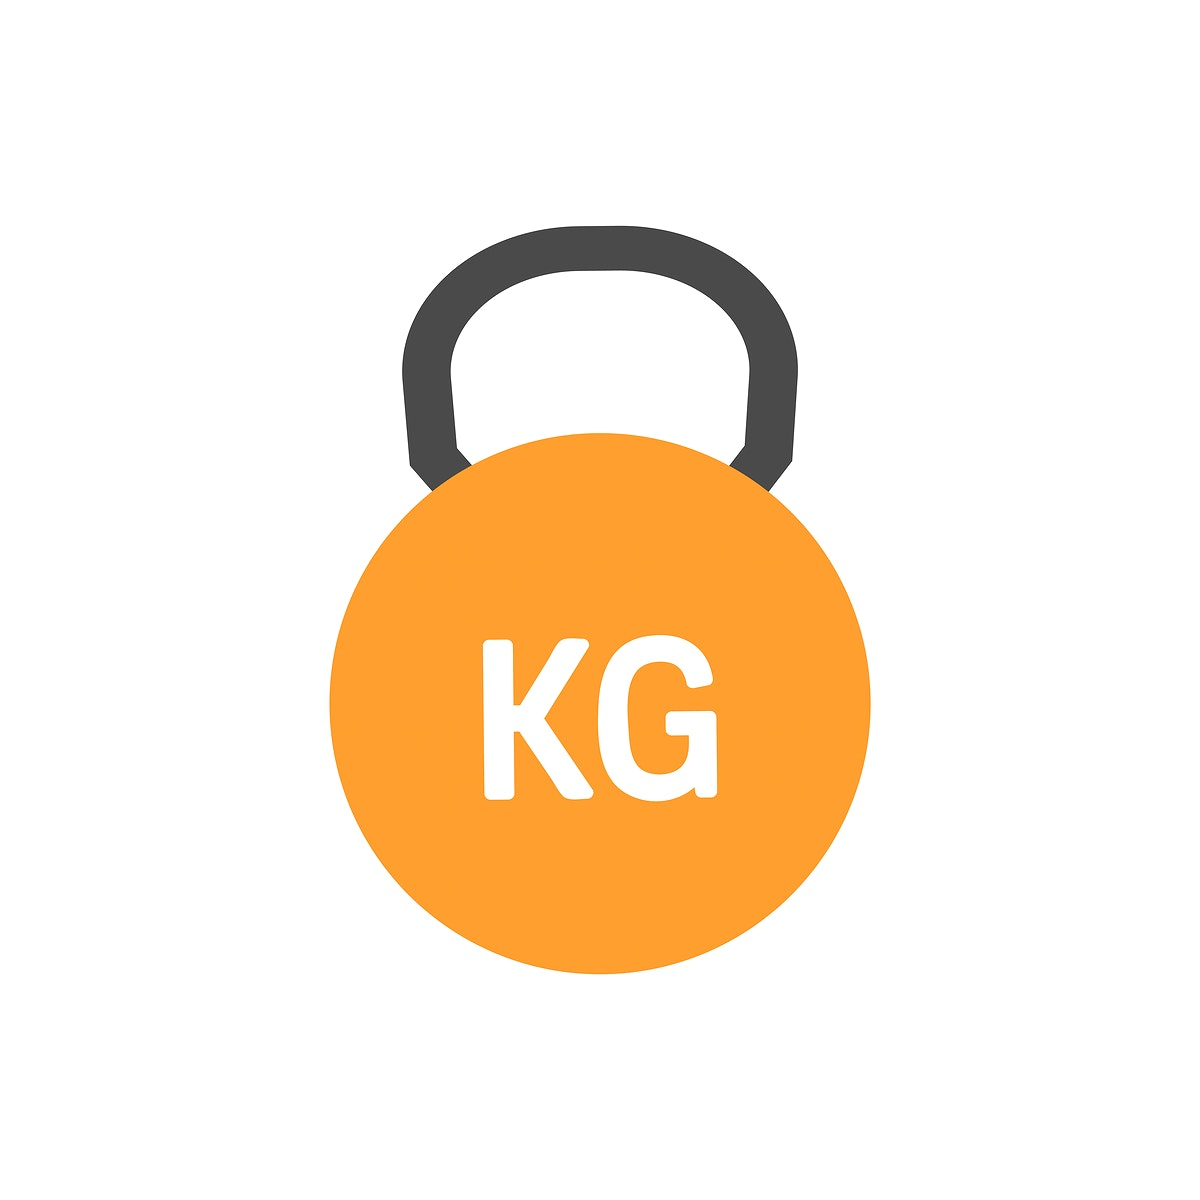 Orange kettlebell icon graphic illustration